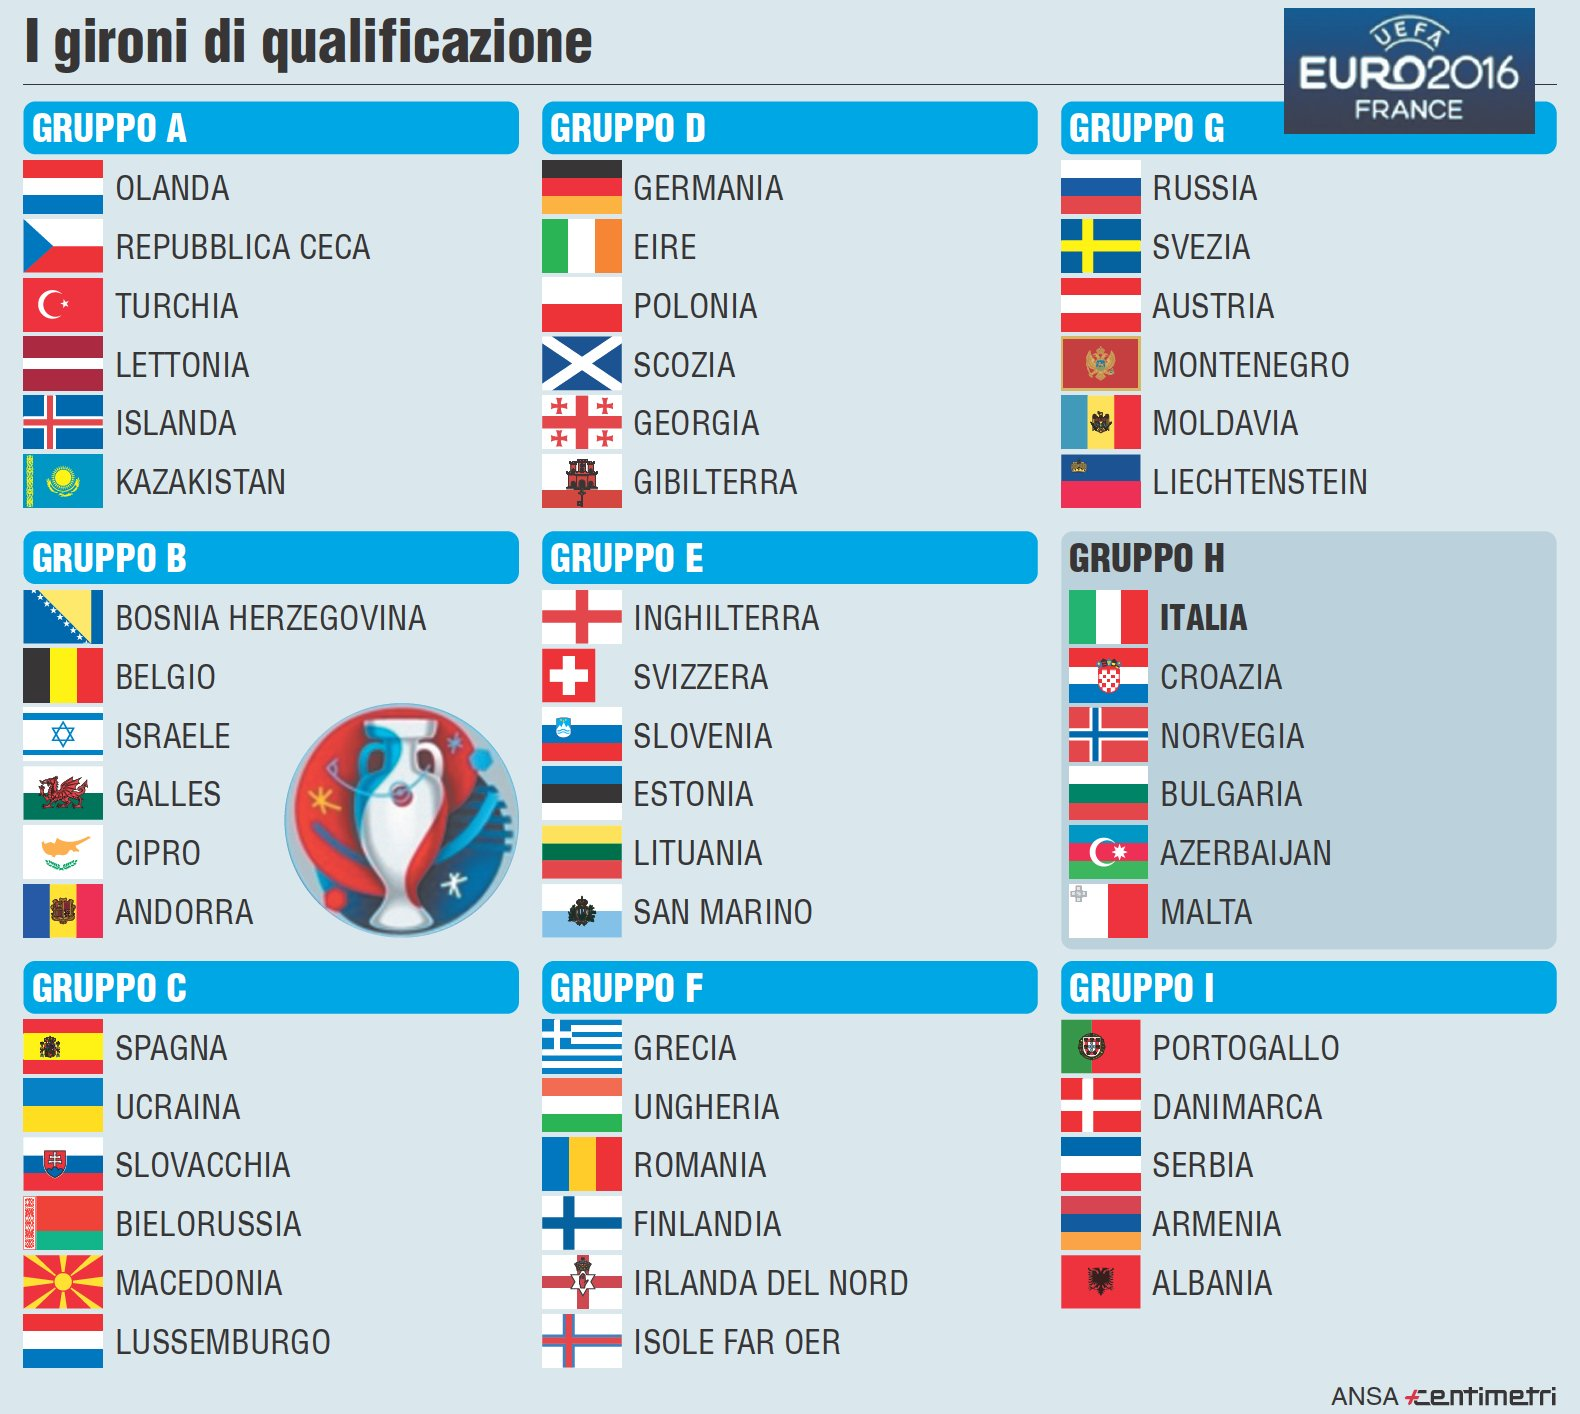 Qualificazioni Euro 2016: i gironi